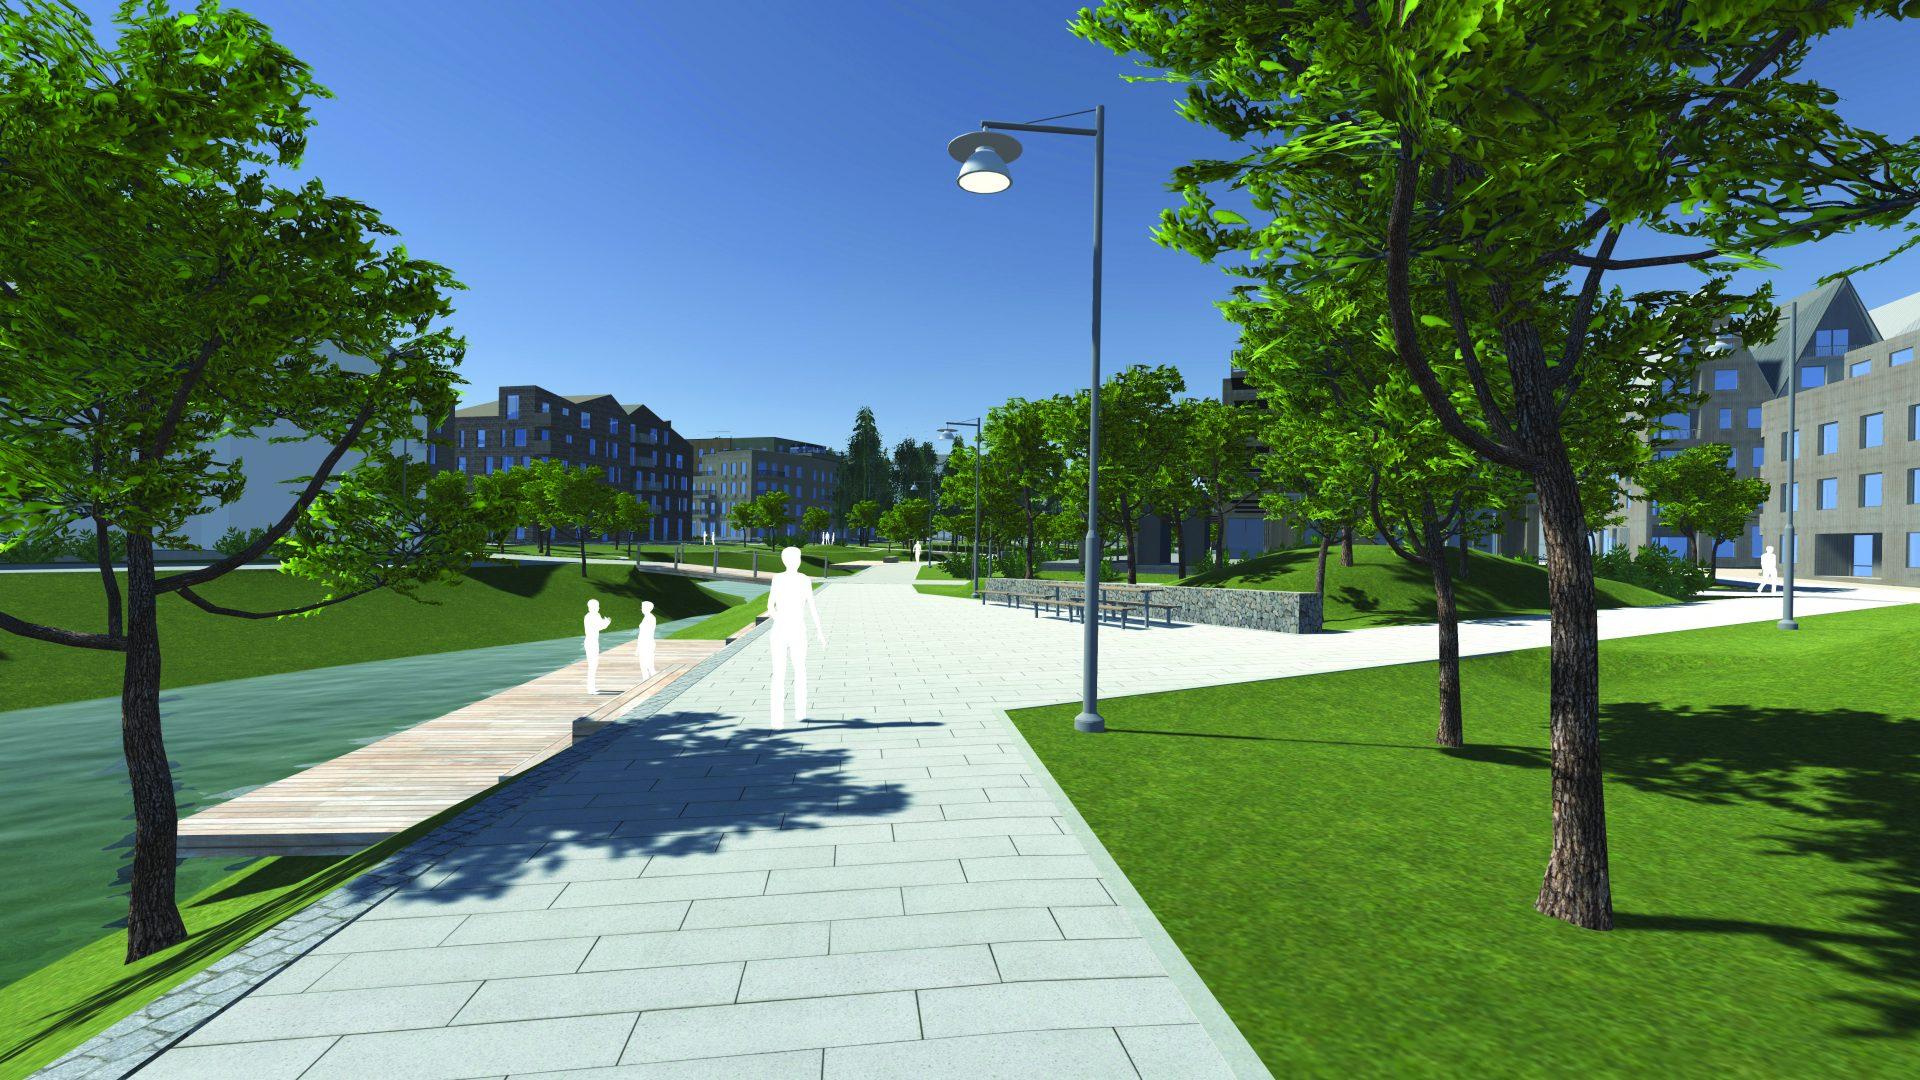 model shows the new Rosendal district in Uppsala, Sweden